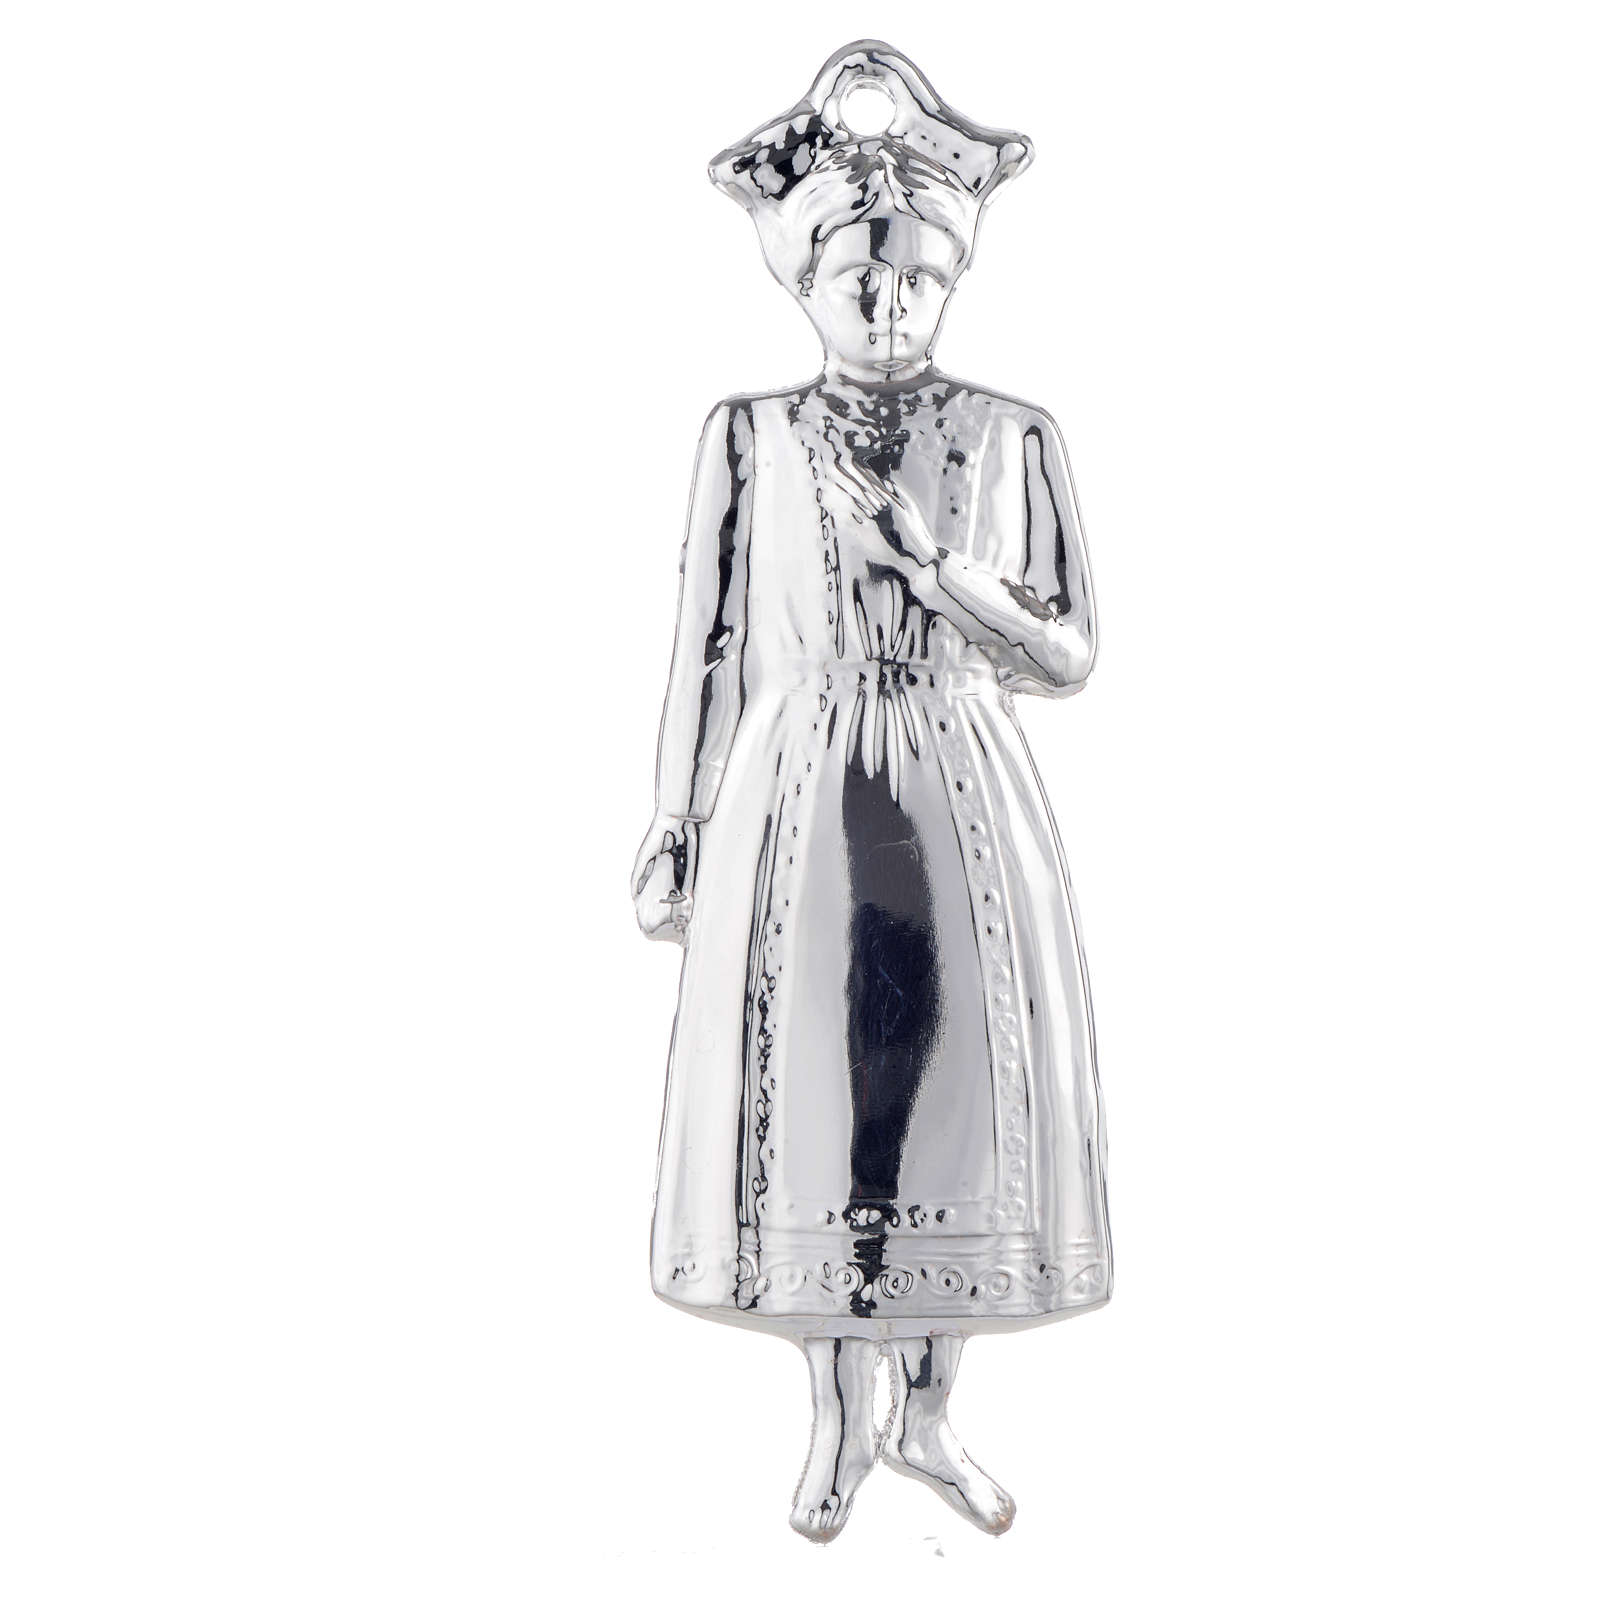 Ex voto bambina argento 925 o metallo 15 cm 3